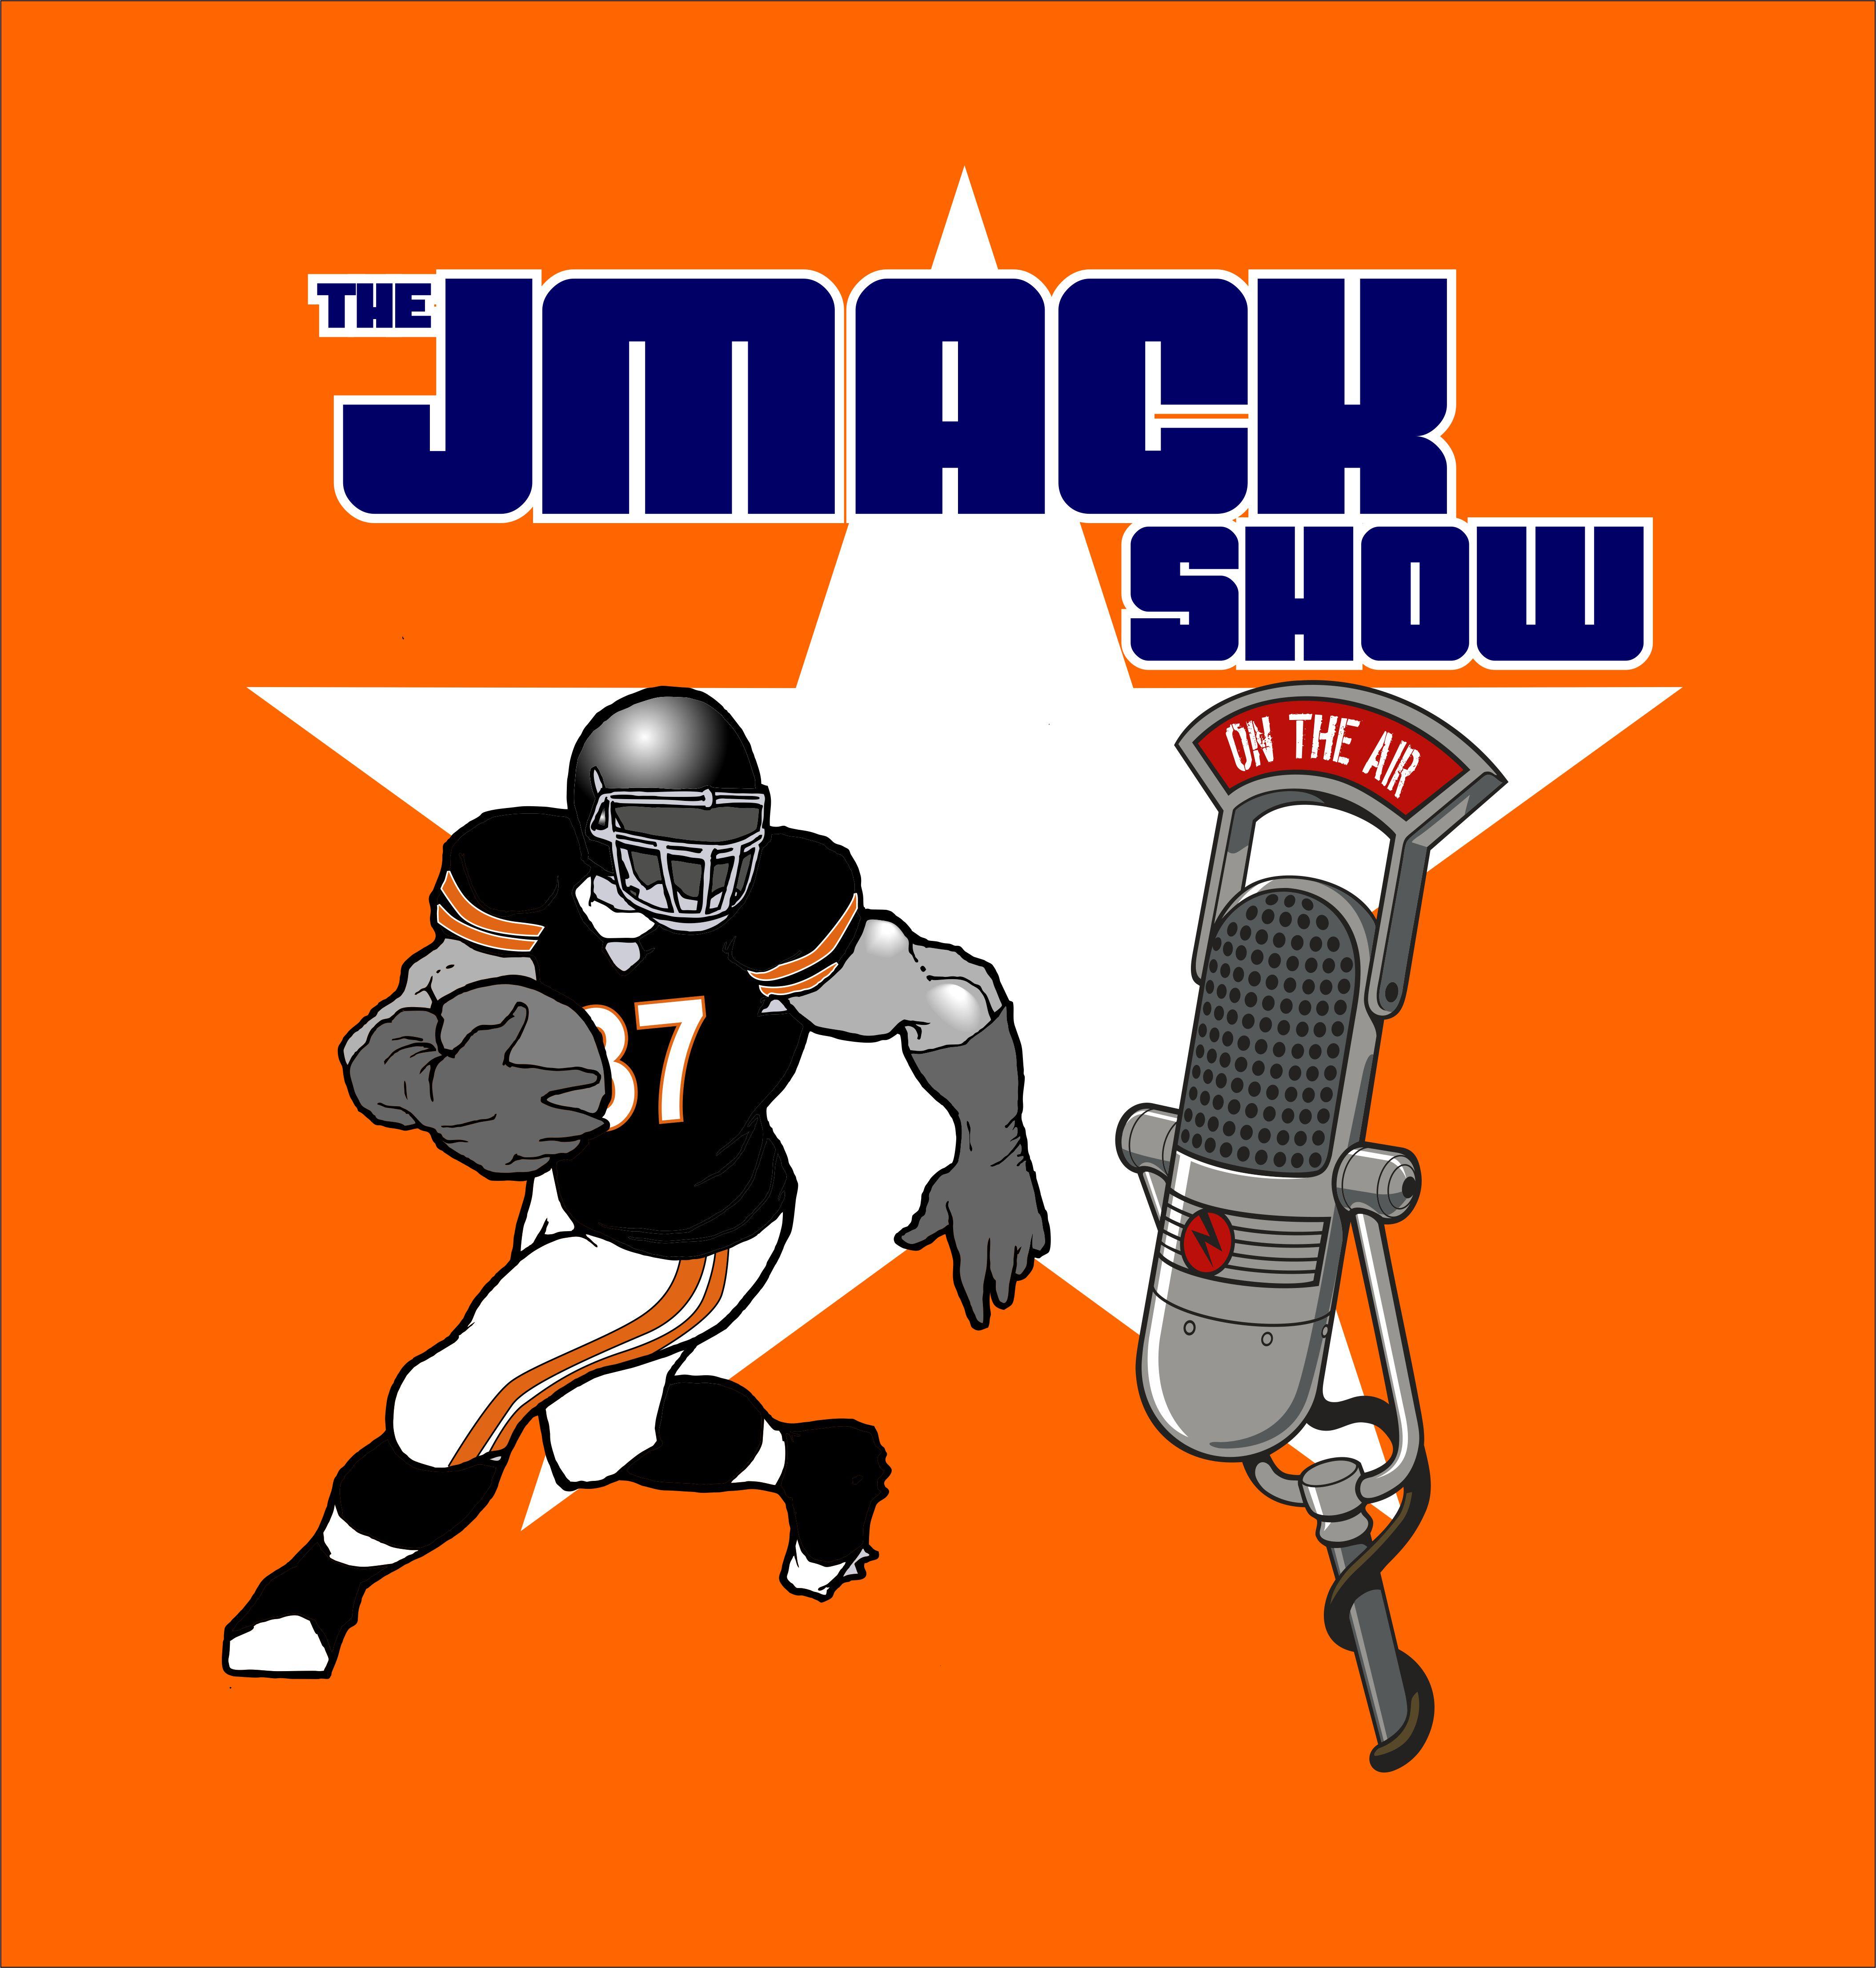 Jmack Show Podcast